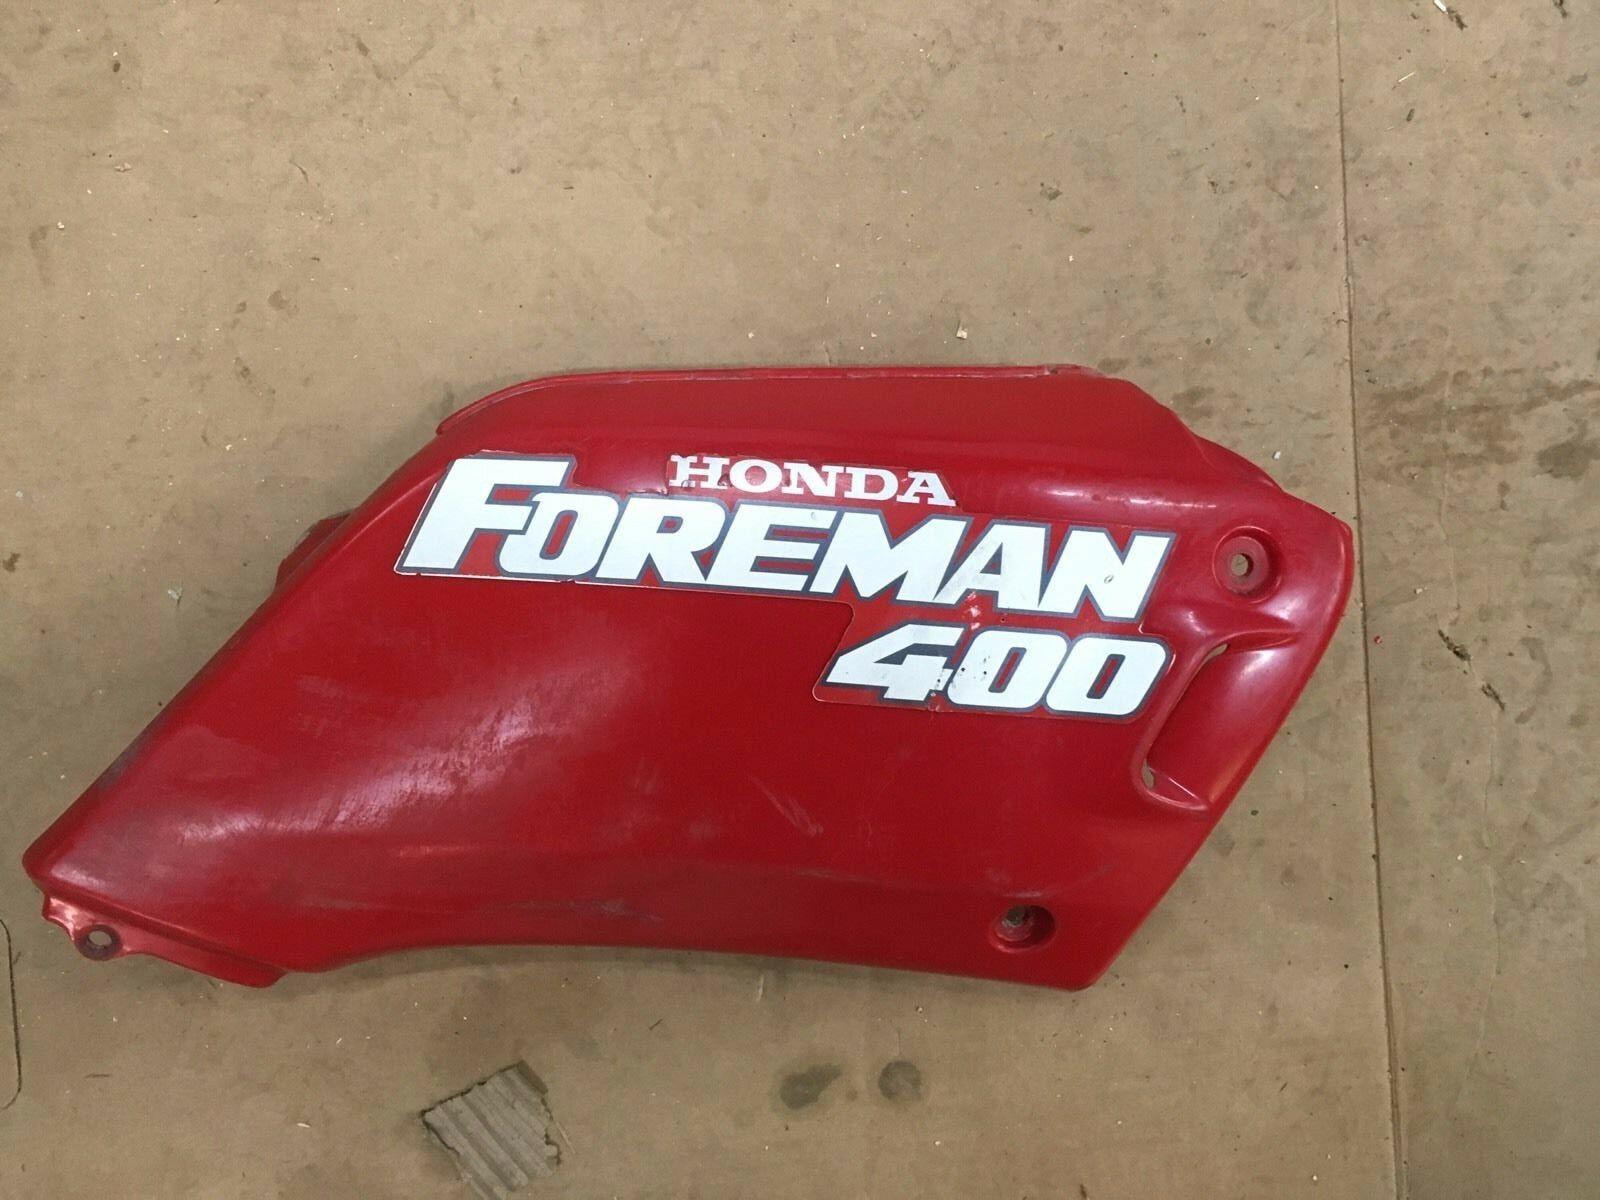 HONDA Foreman 400 RIGHT PANEL FENDER